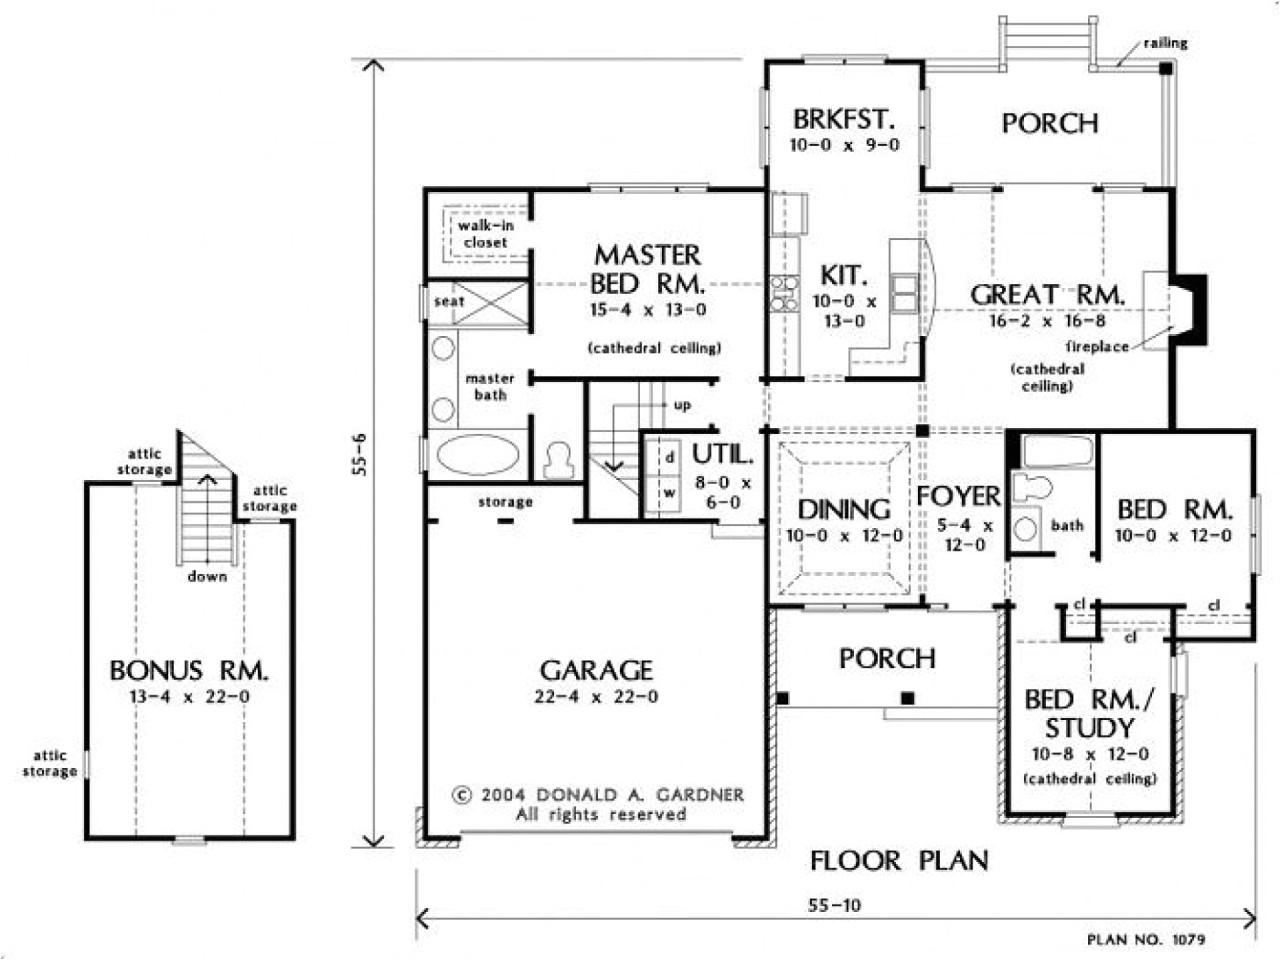 Home Plan Drawing Free Drawing Floor Plans Online Floor Plan Drawing